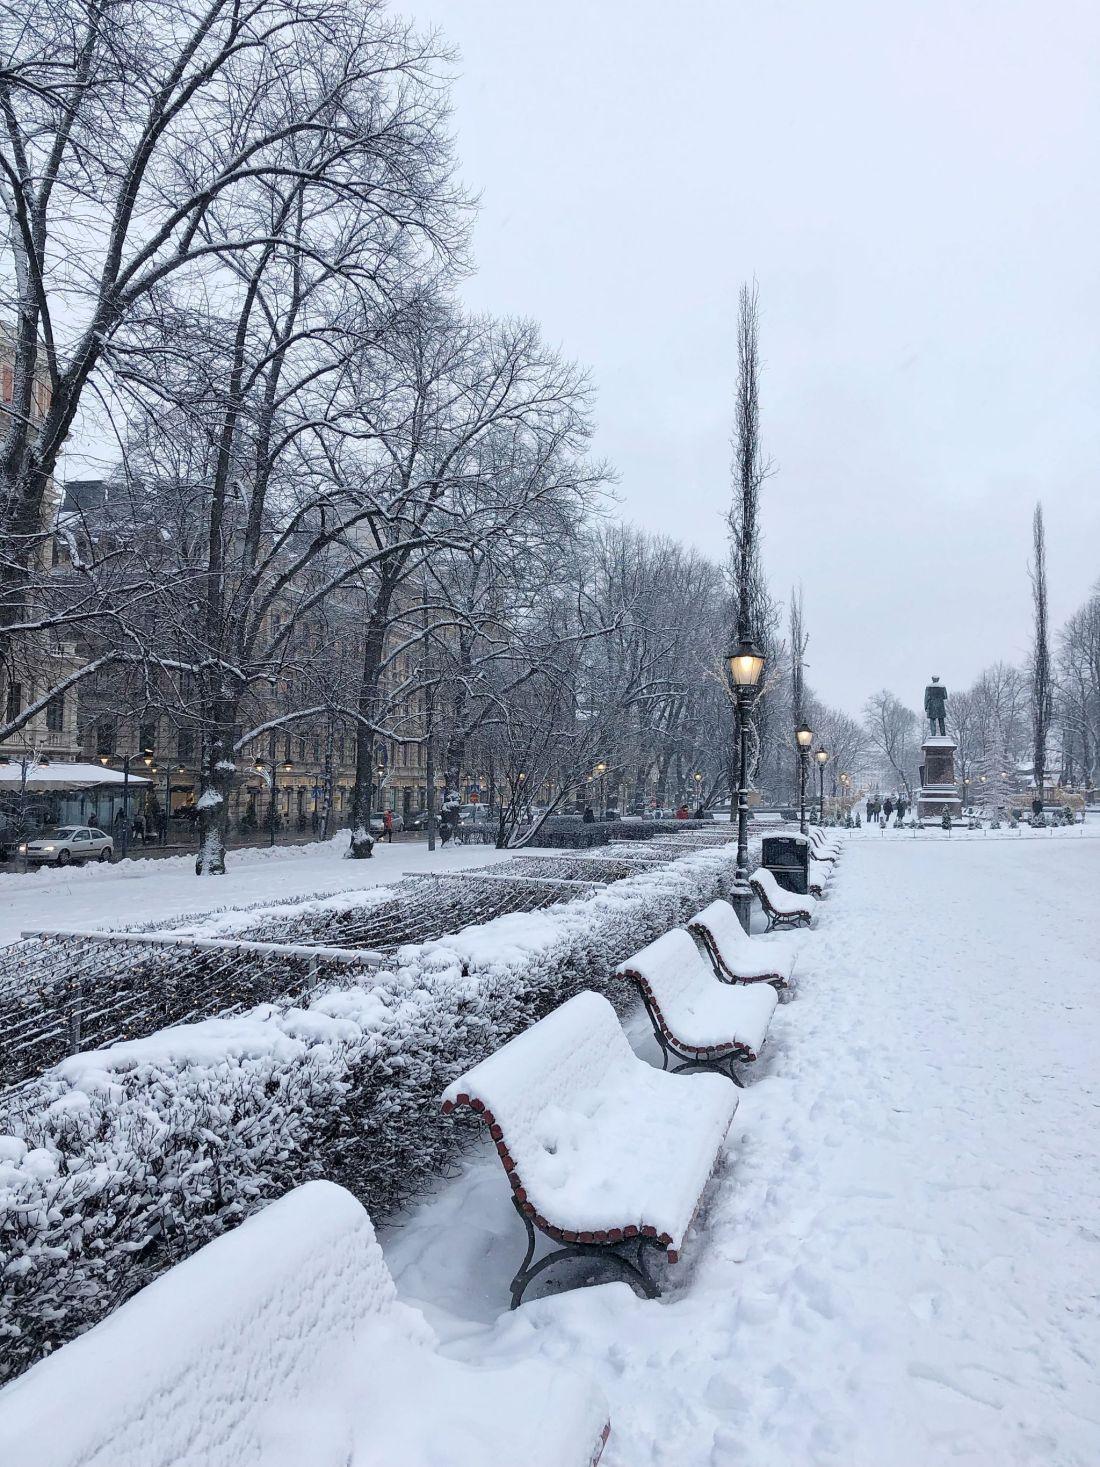 Snowy Helsinki Park